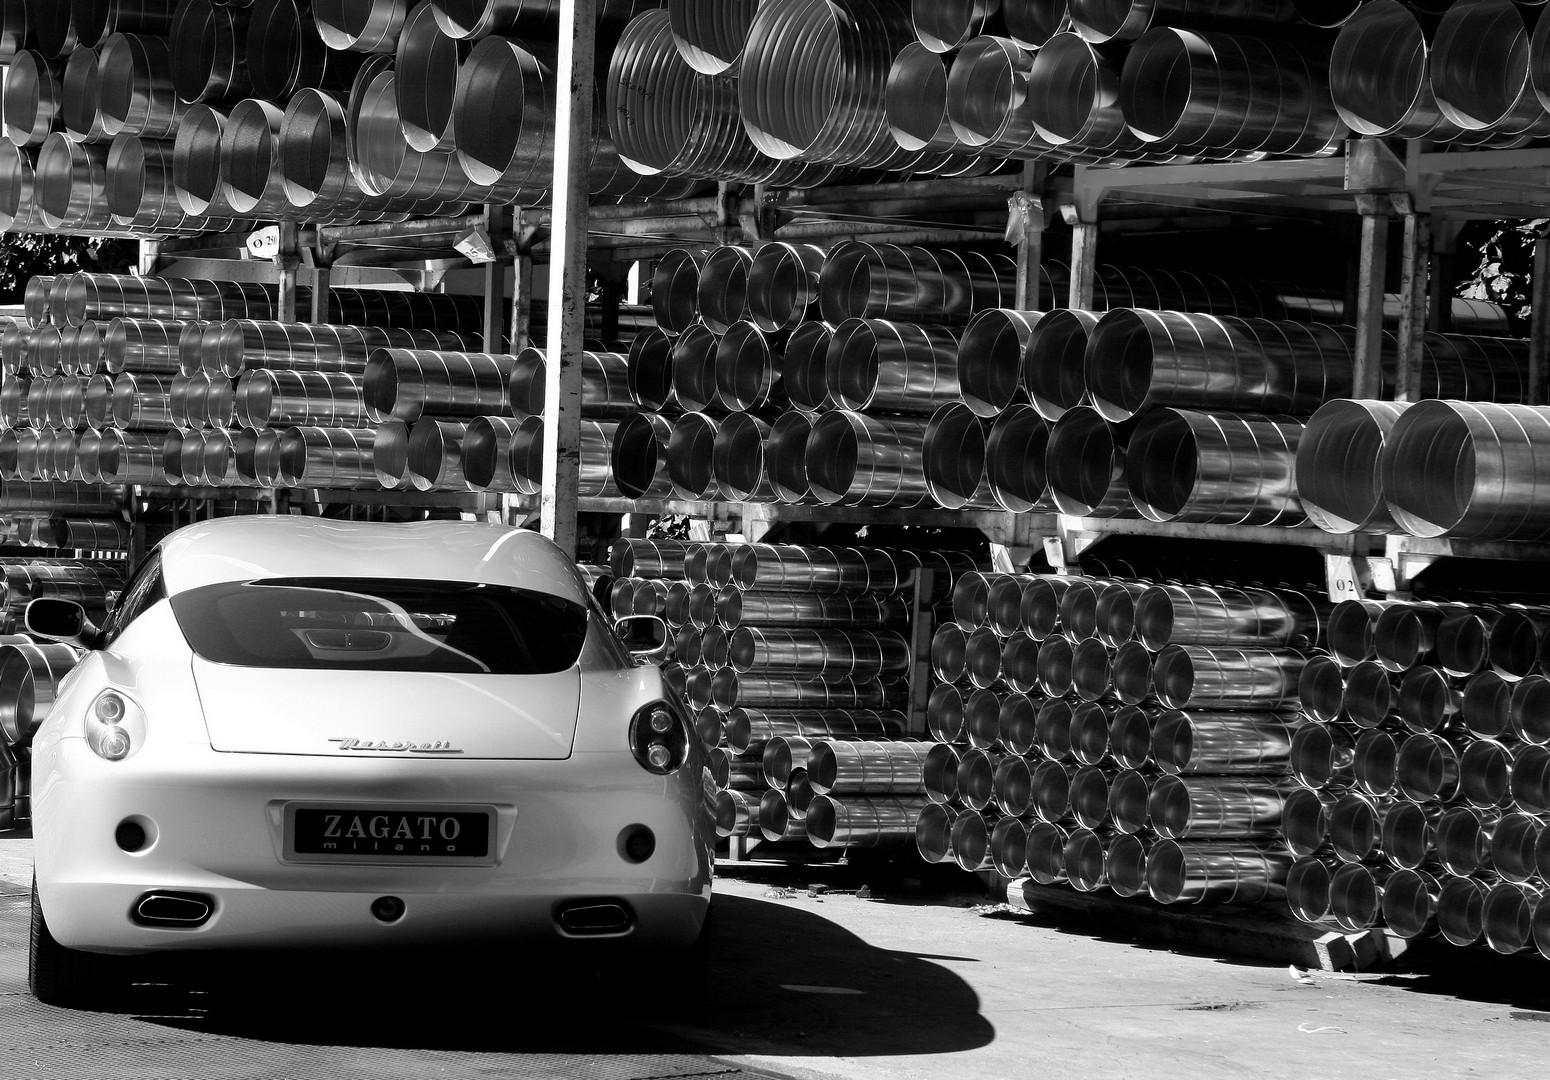 http://www.carstyling.ru/resources/studios/2007-Zagato-Maserati-GS-01.jpg